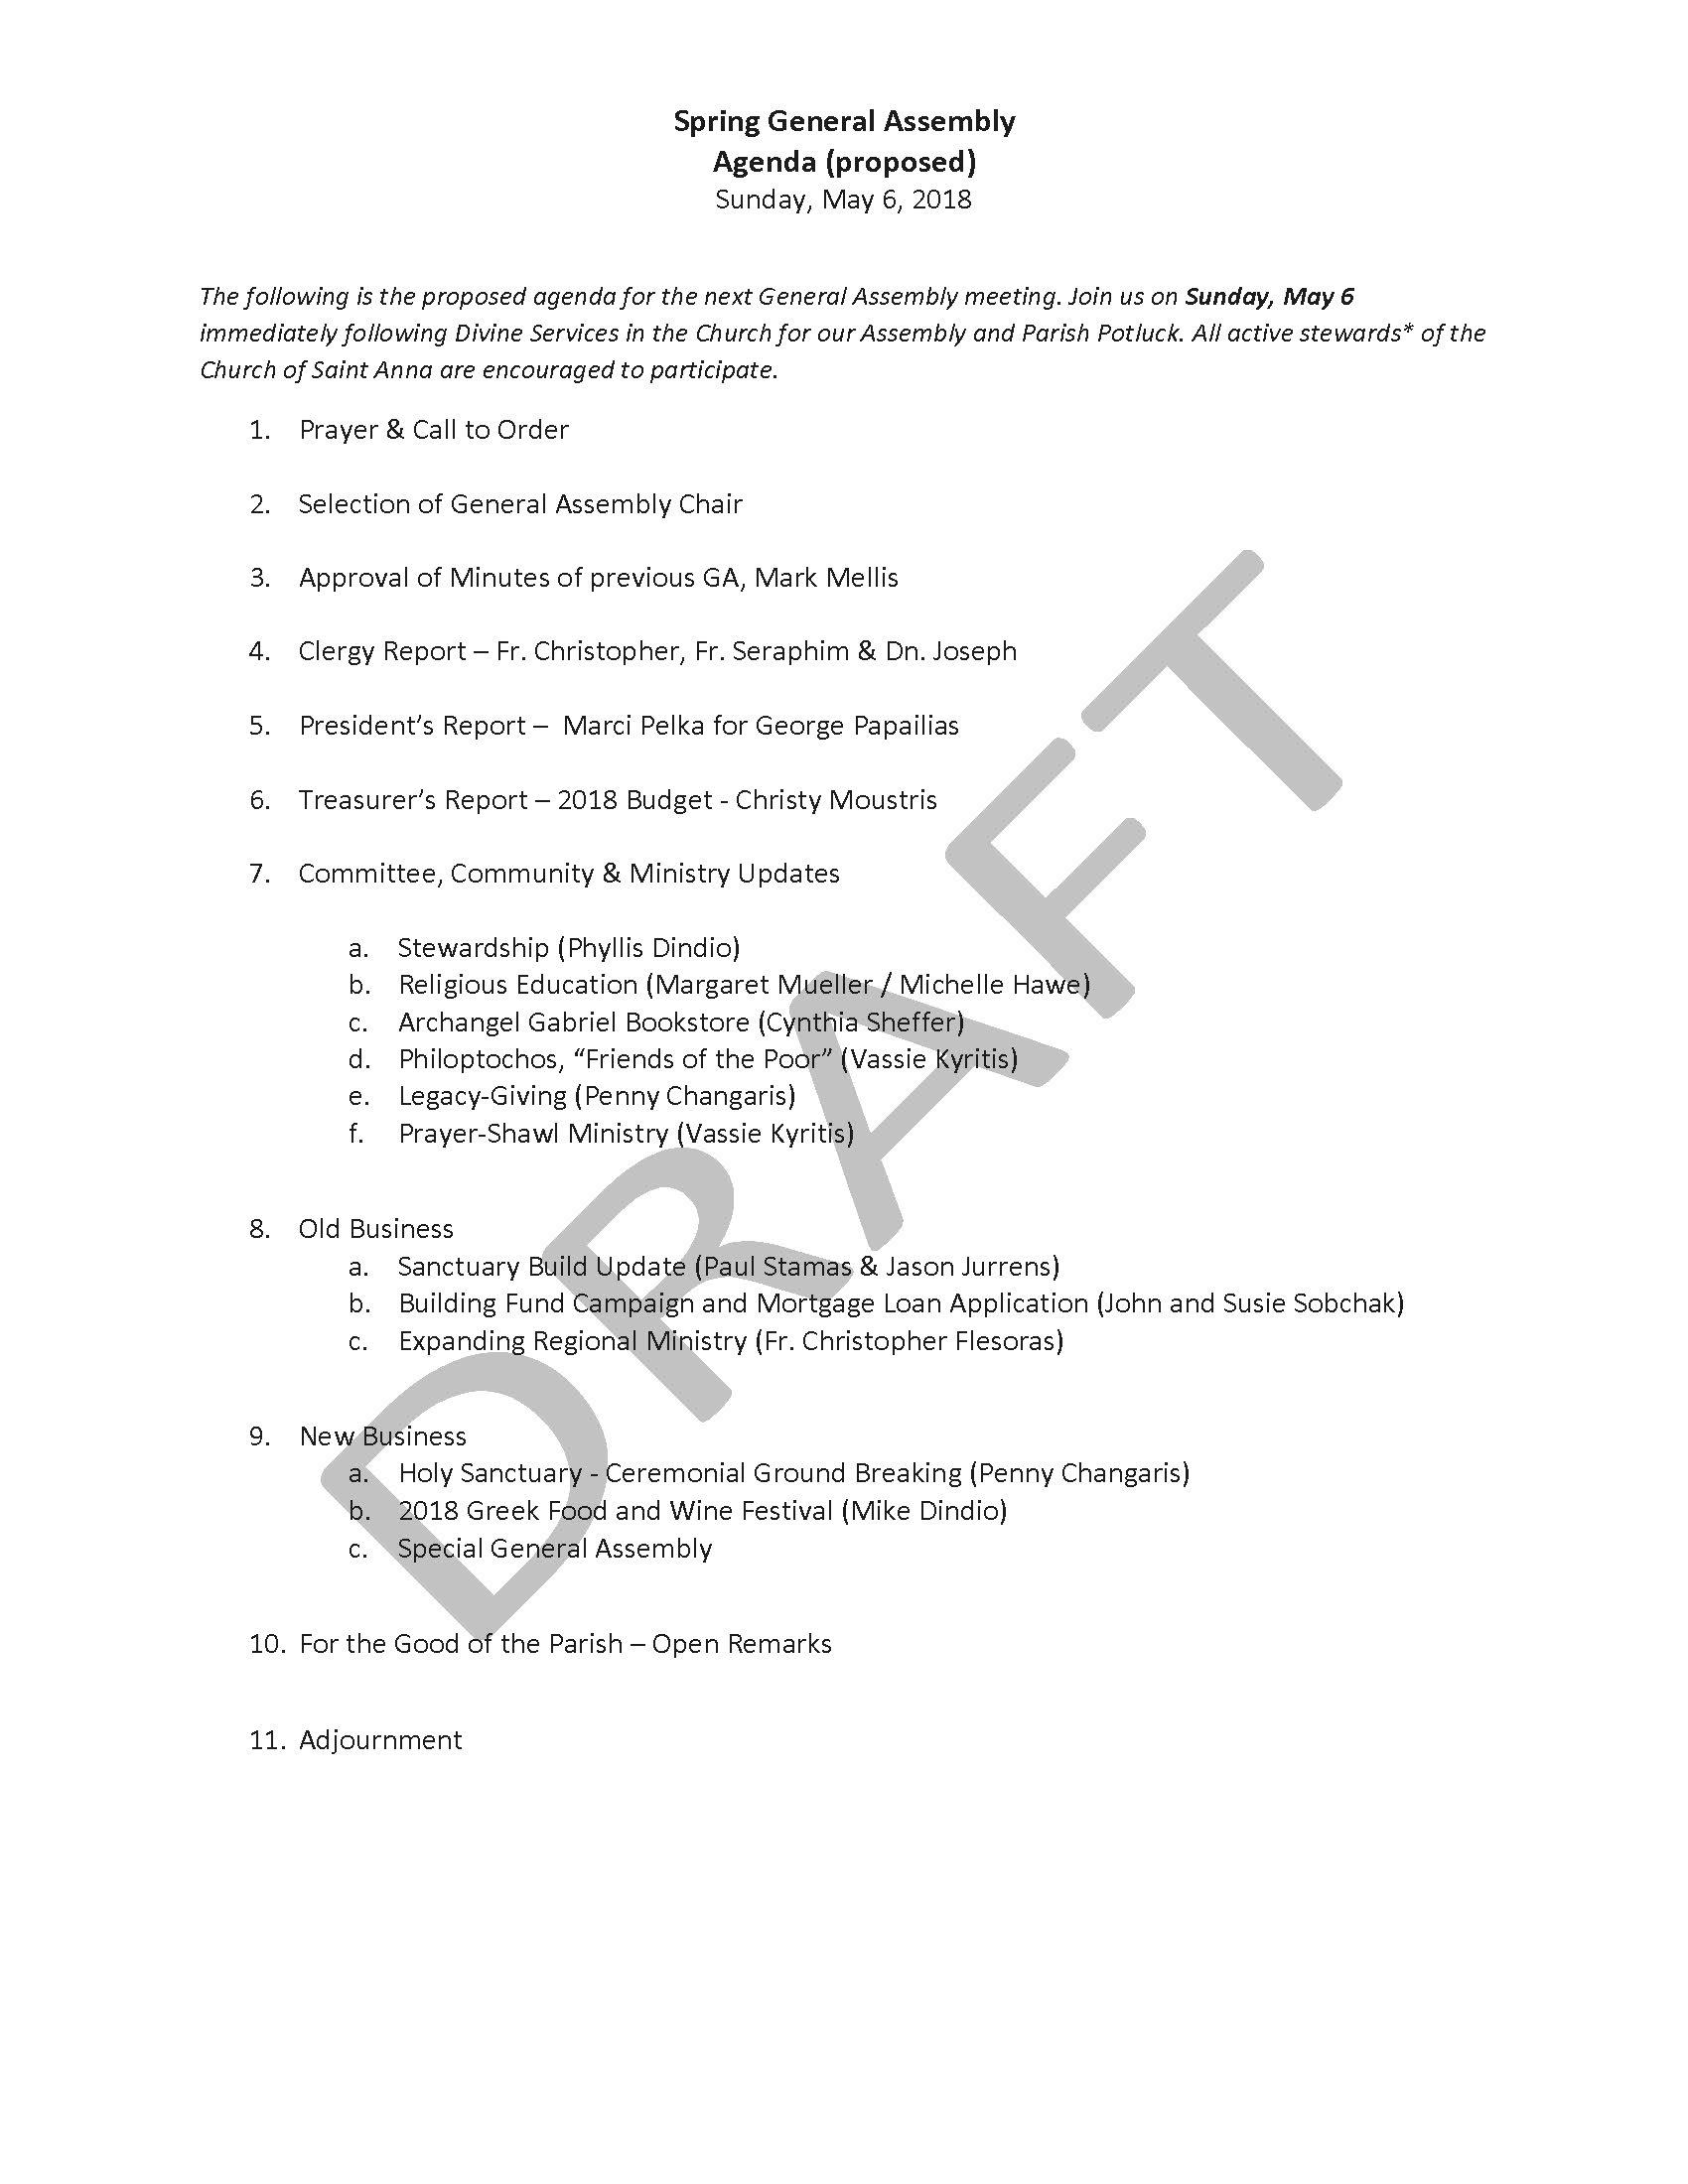 2018 Spring General Assembly - Proposed Agenda.jpg